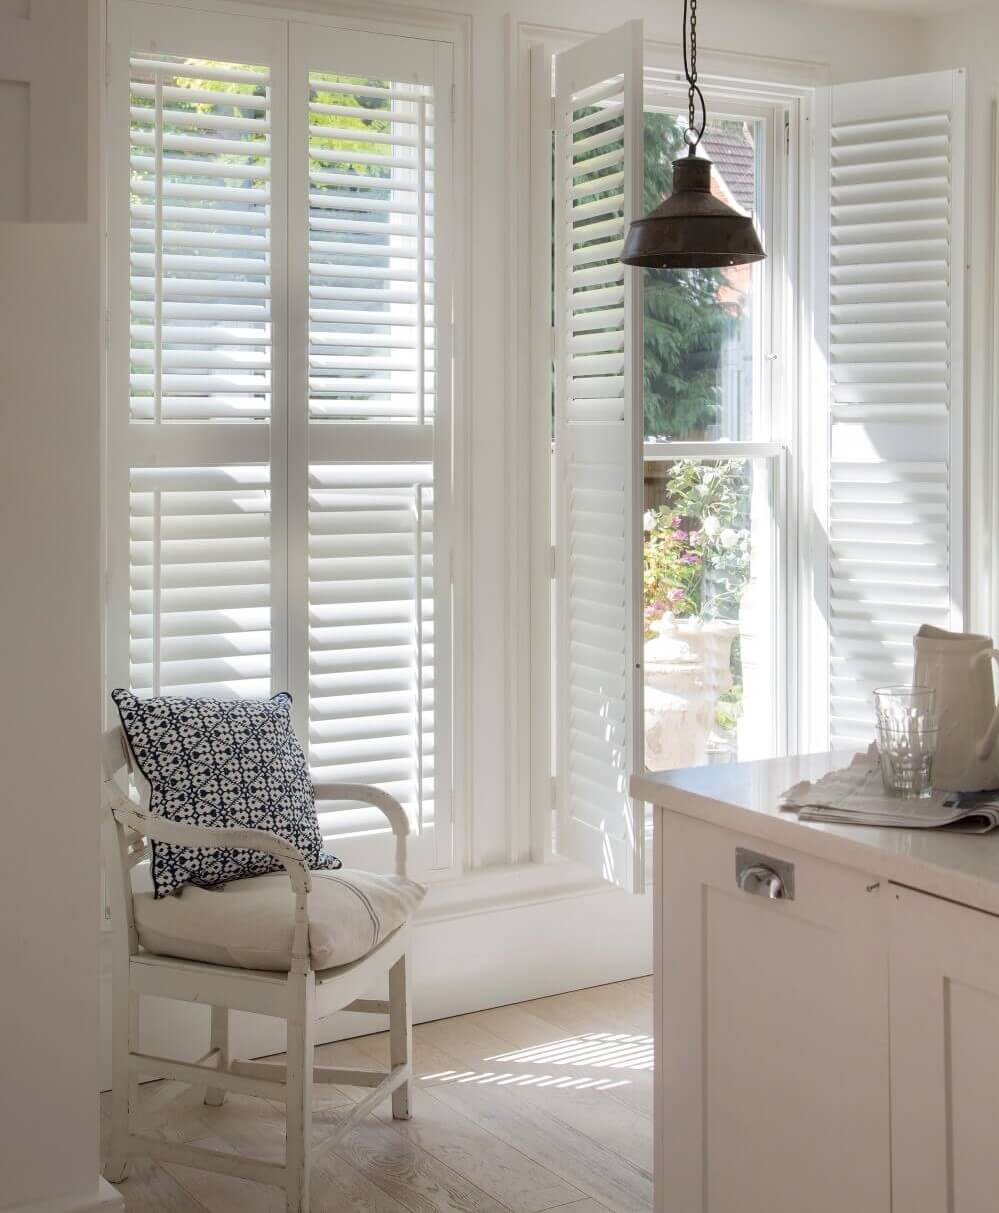 wooden window shutters more solihull blinds. Black Bedroom Furniture Sets. Home Design Ideas